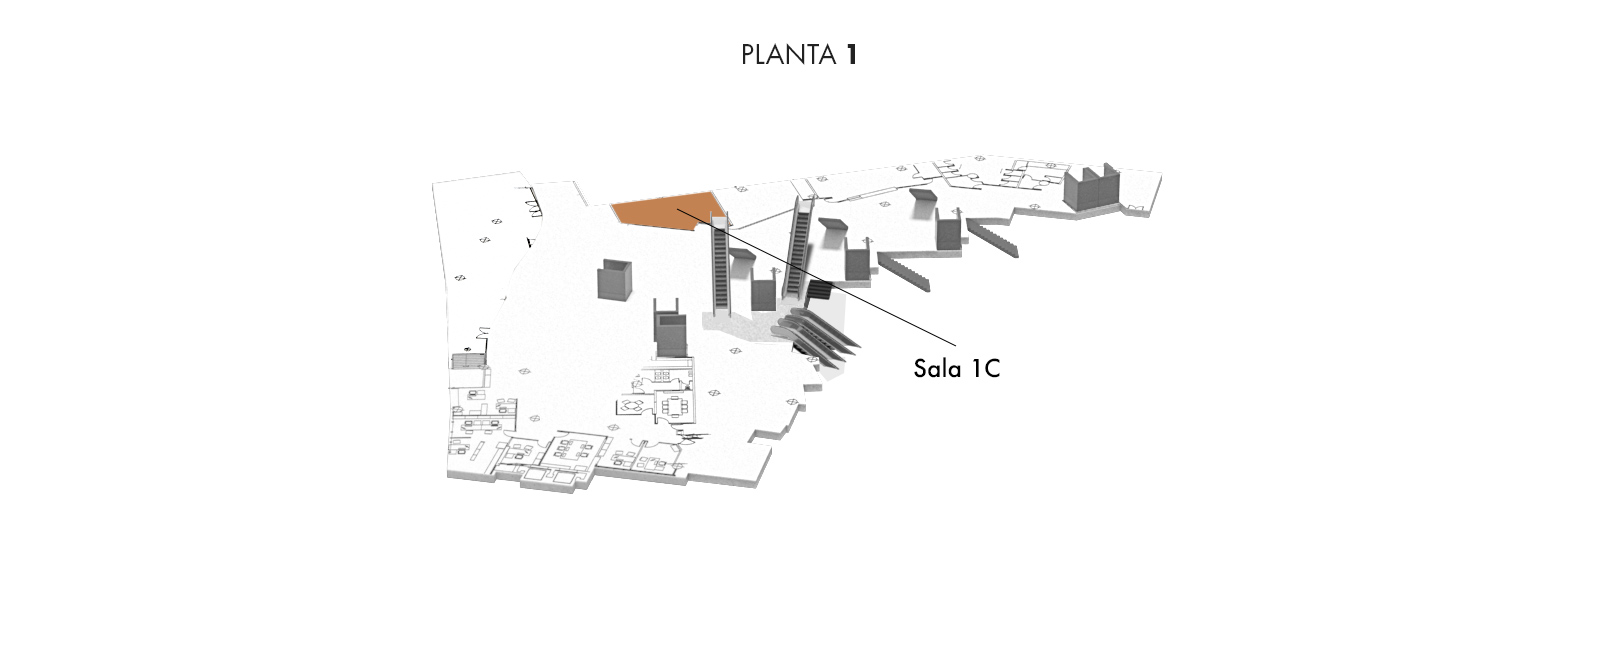 Sala 1C, Planta 1 | Palacio Euskalduna Jauregia